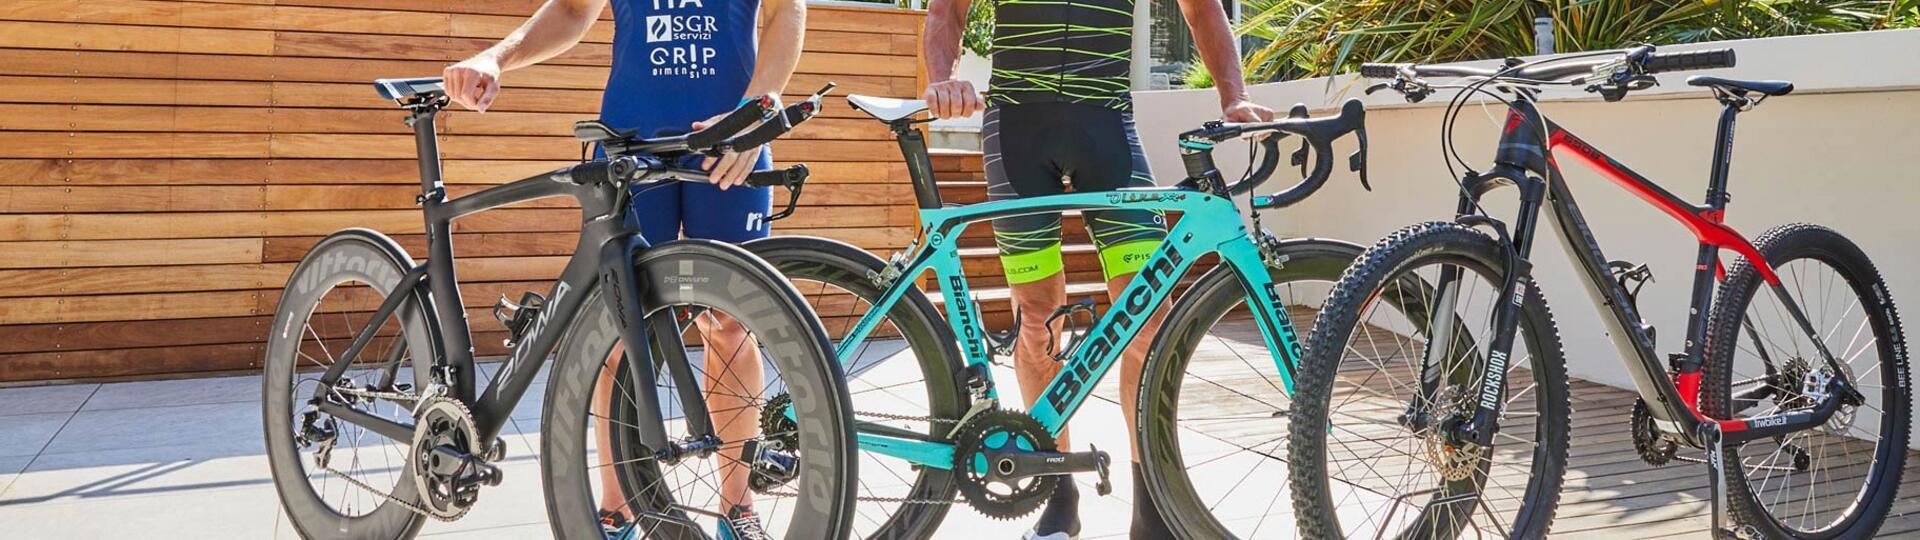 cycling.oxygenhotel it noleggio-bici-rimini 006